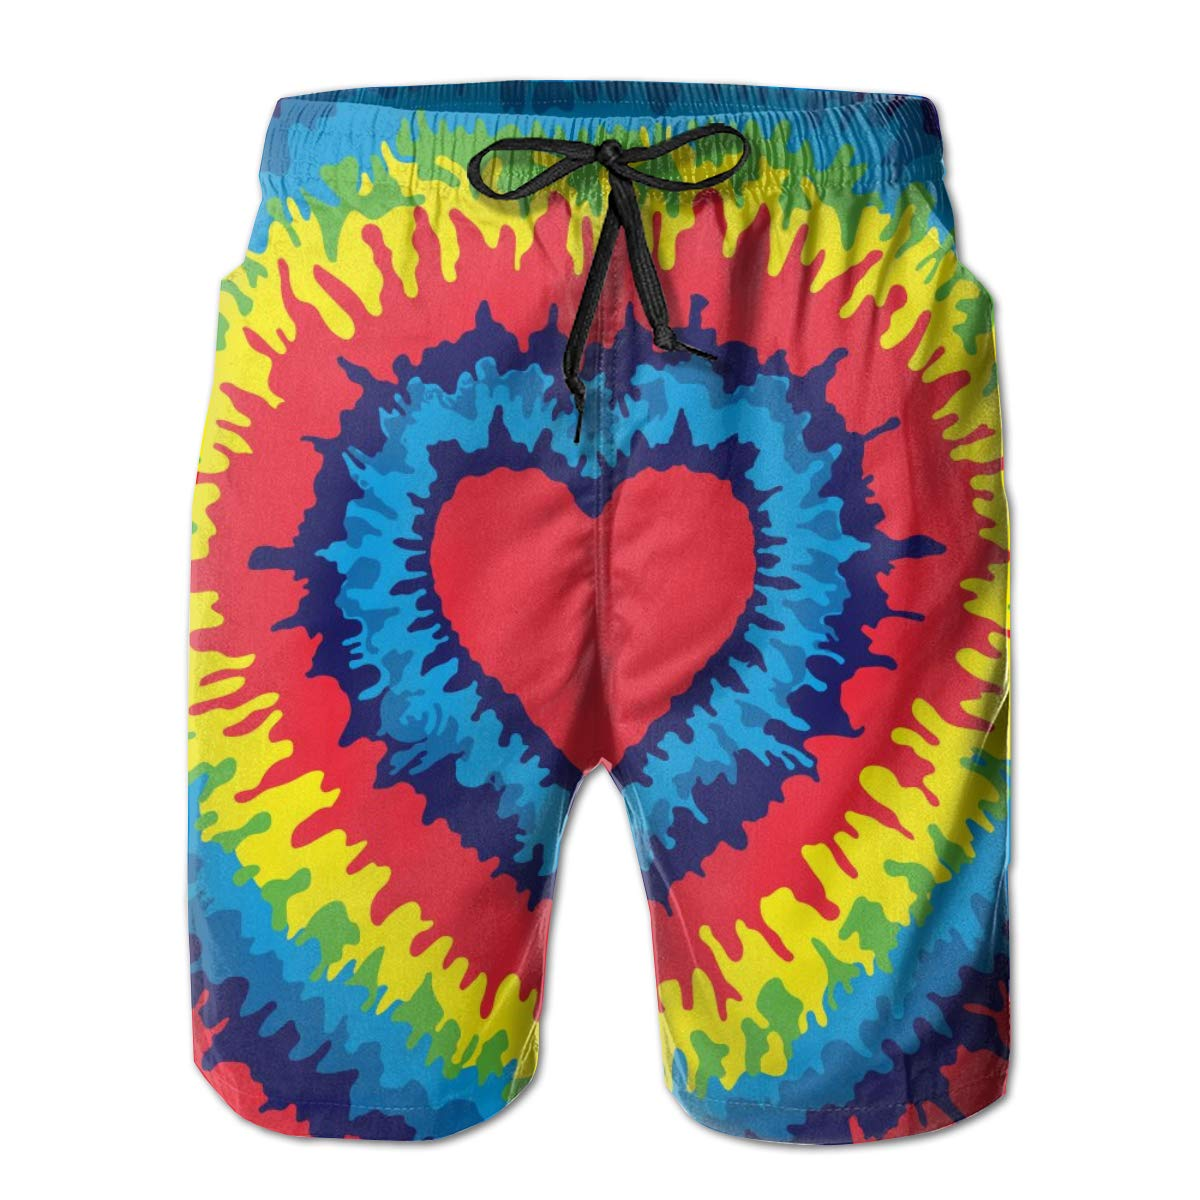 TNIJWMG Mens Board Shorts Colorful Tie Dye Holiday Swim Trunks Mesh Lining